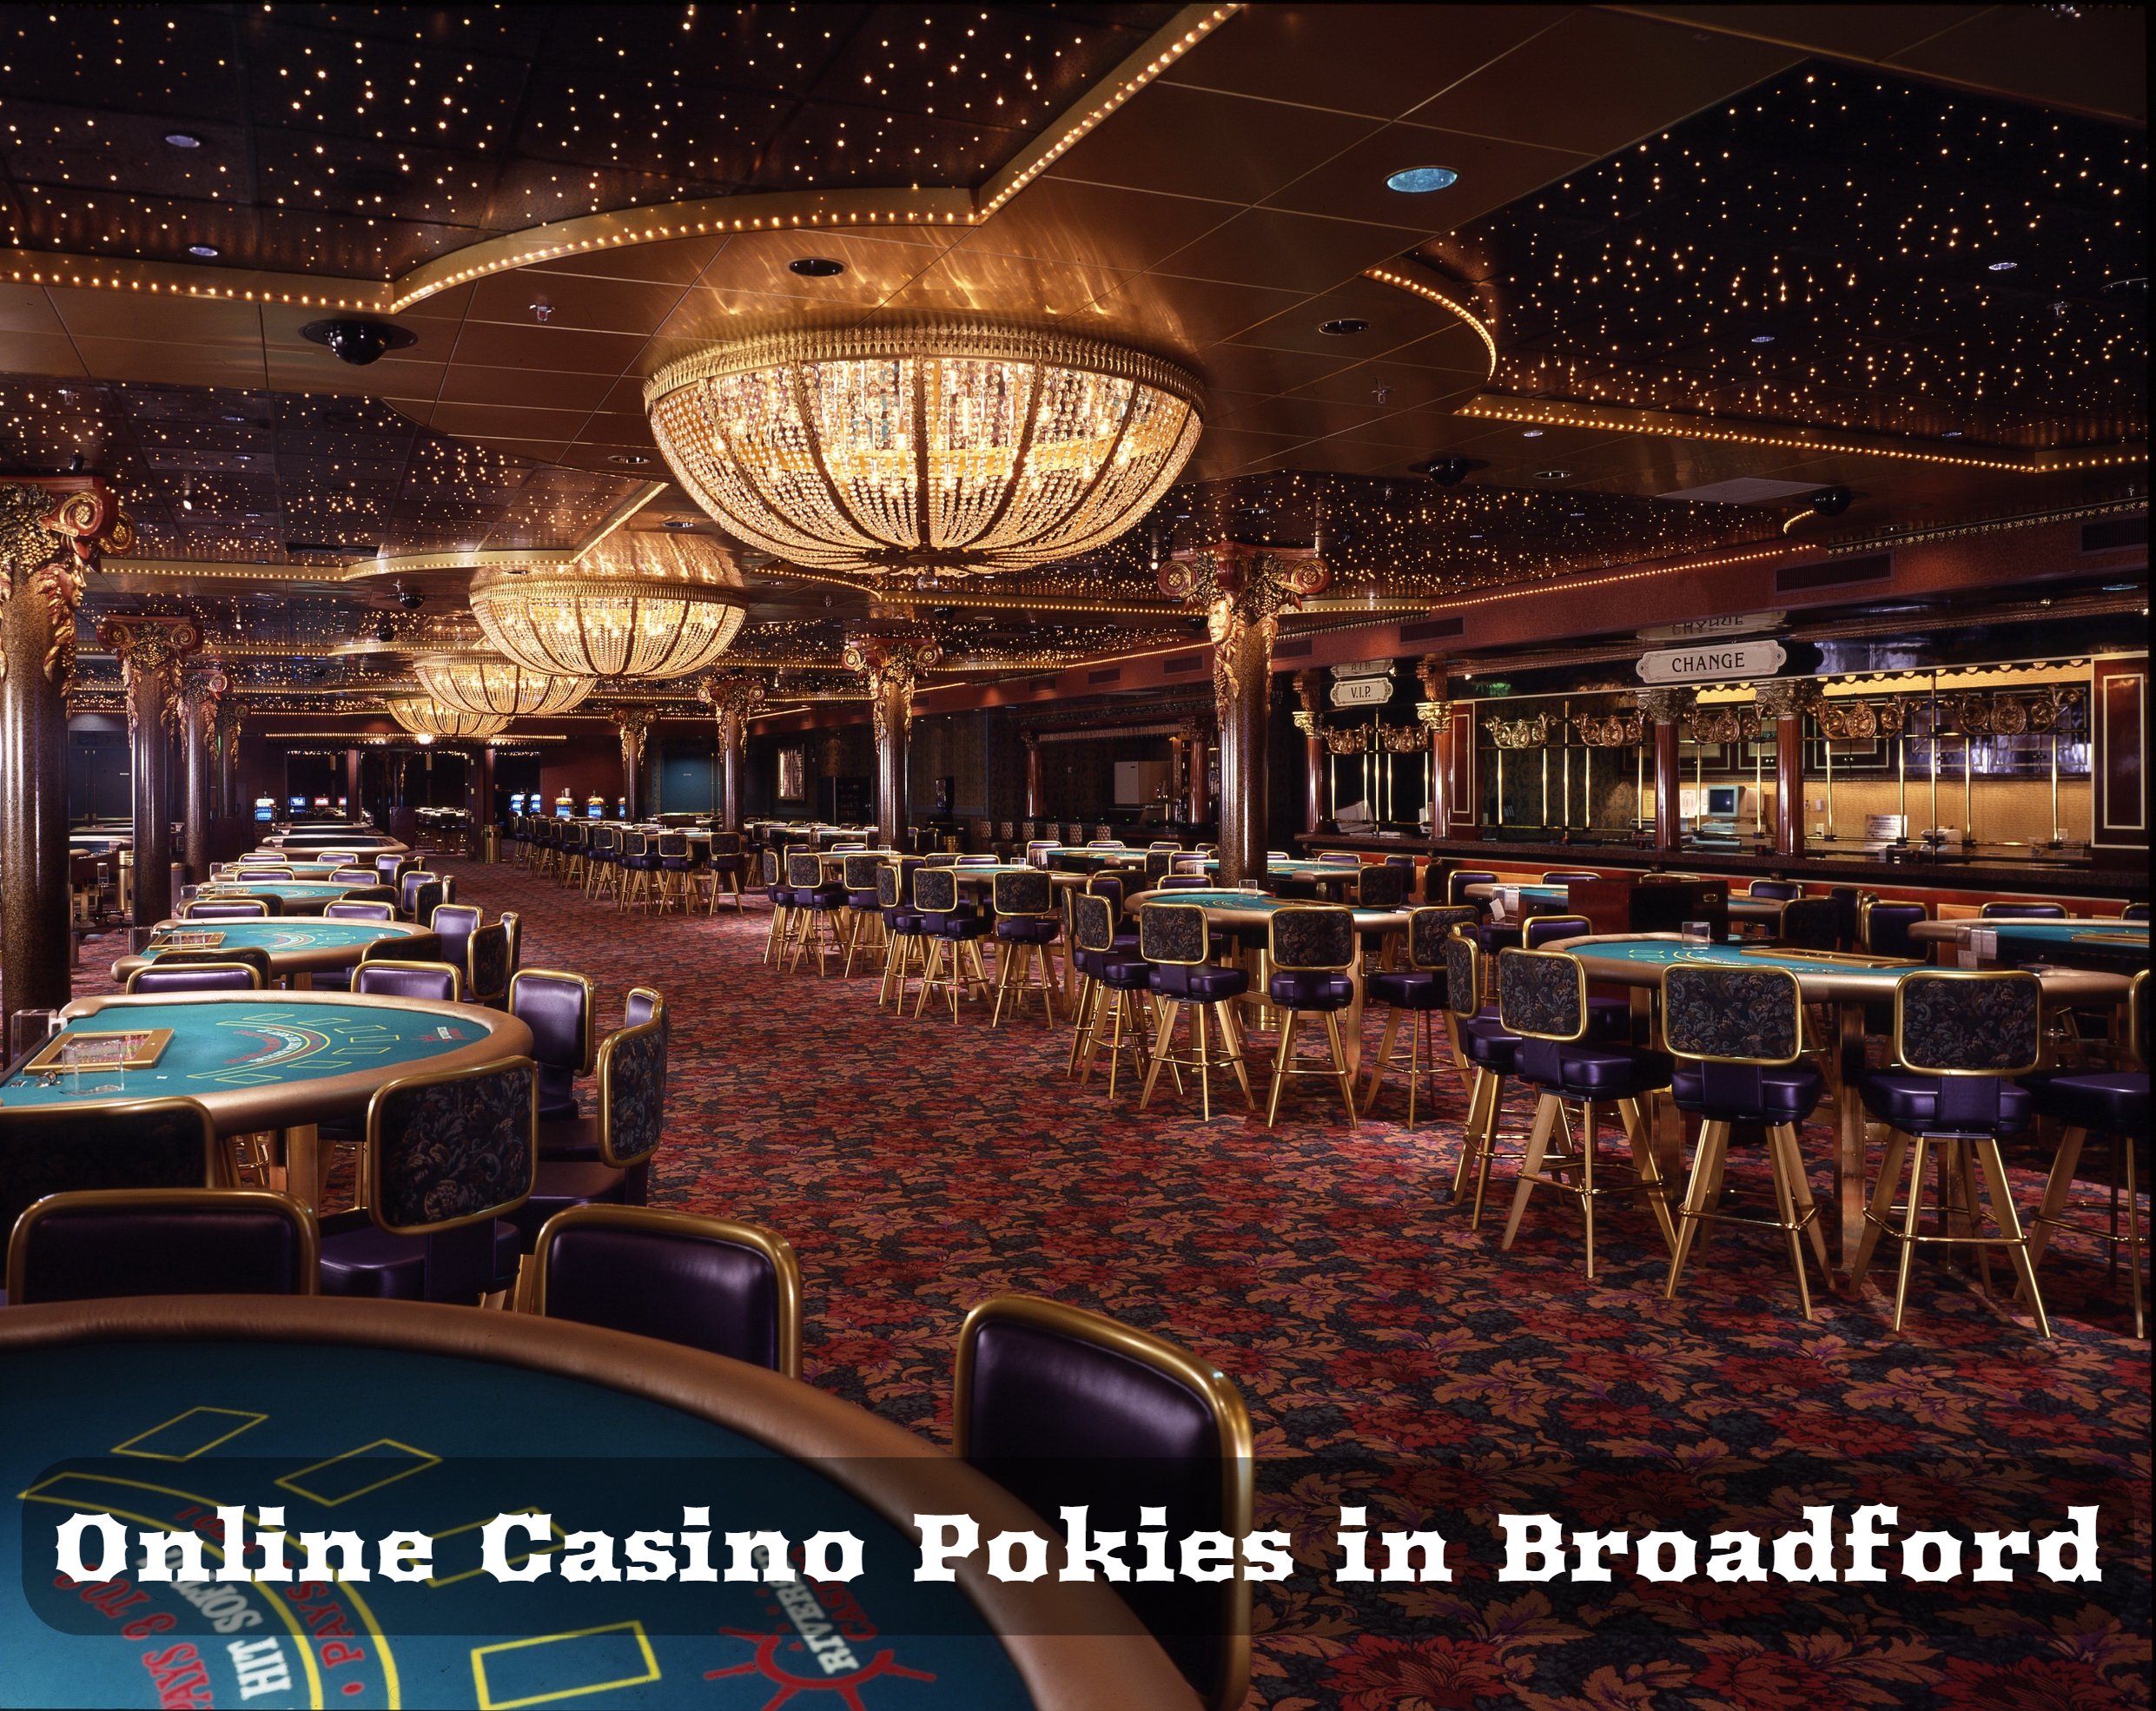 Online Casino Pokies in Broadford